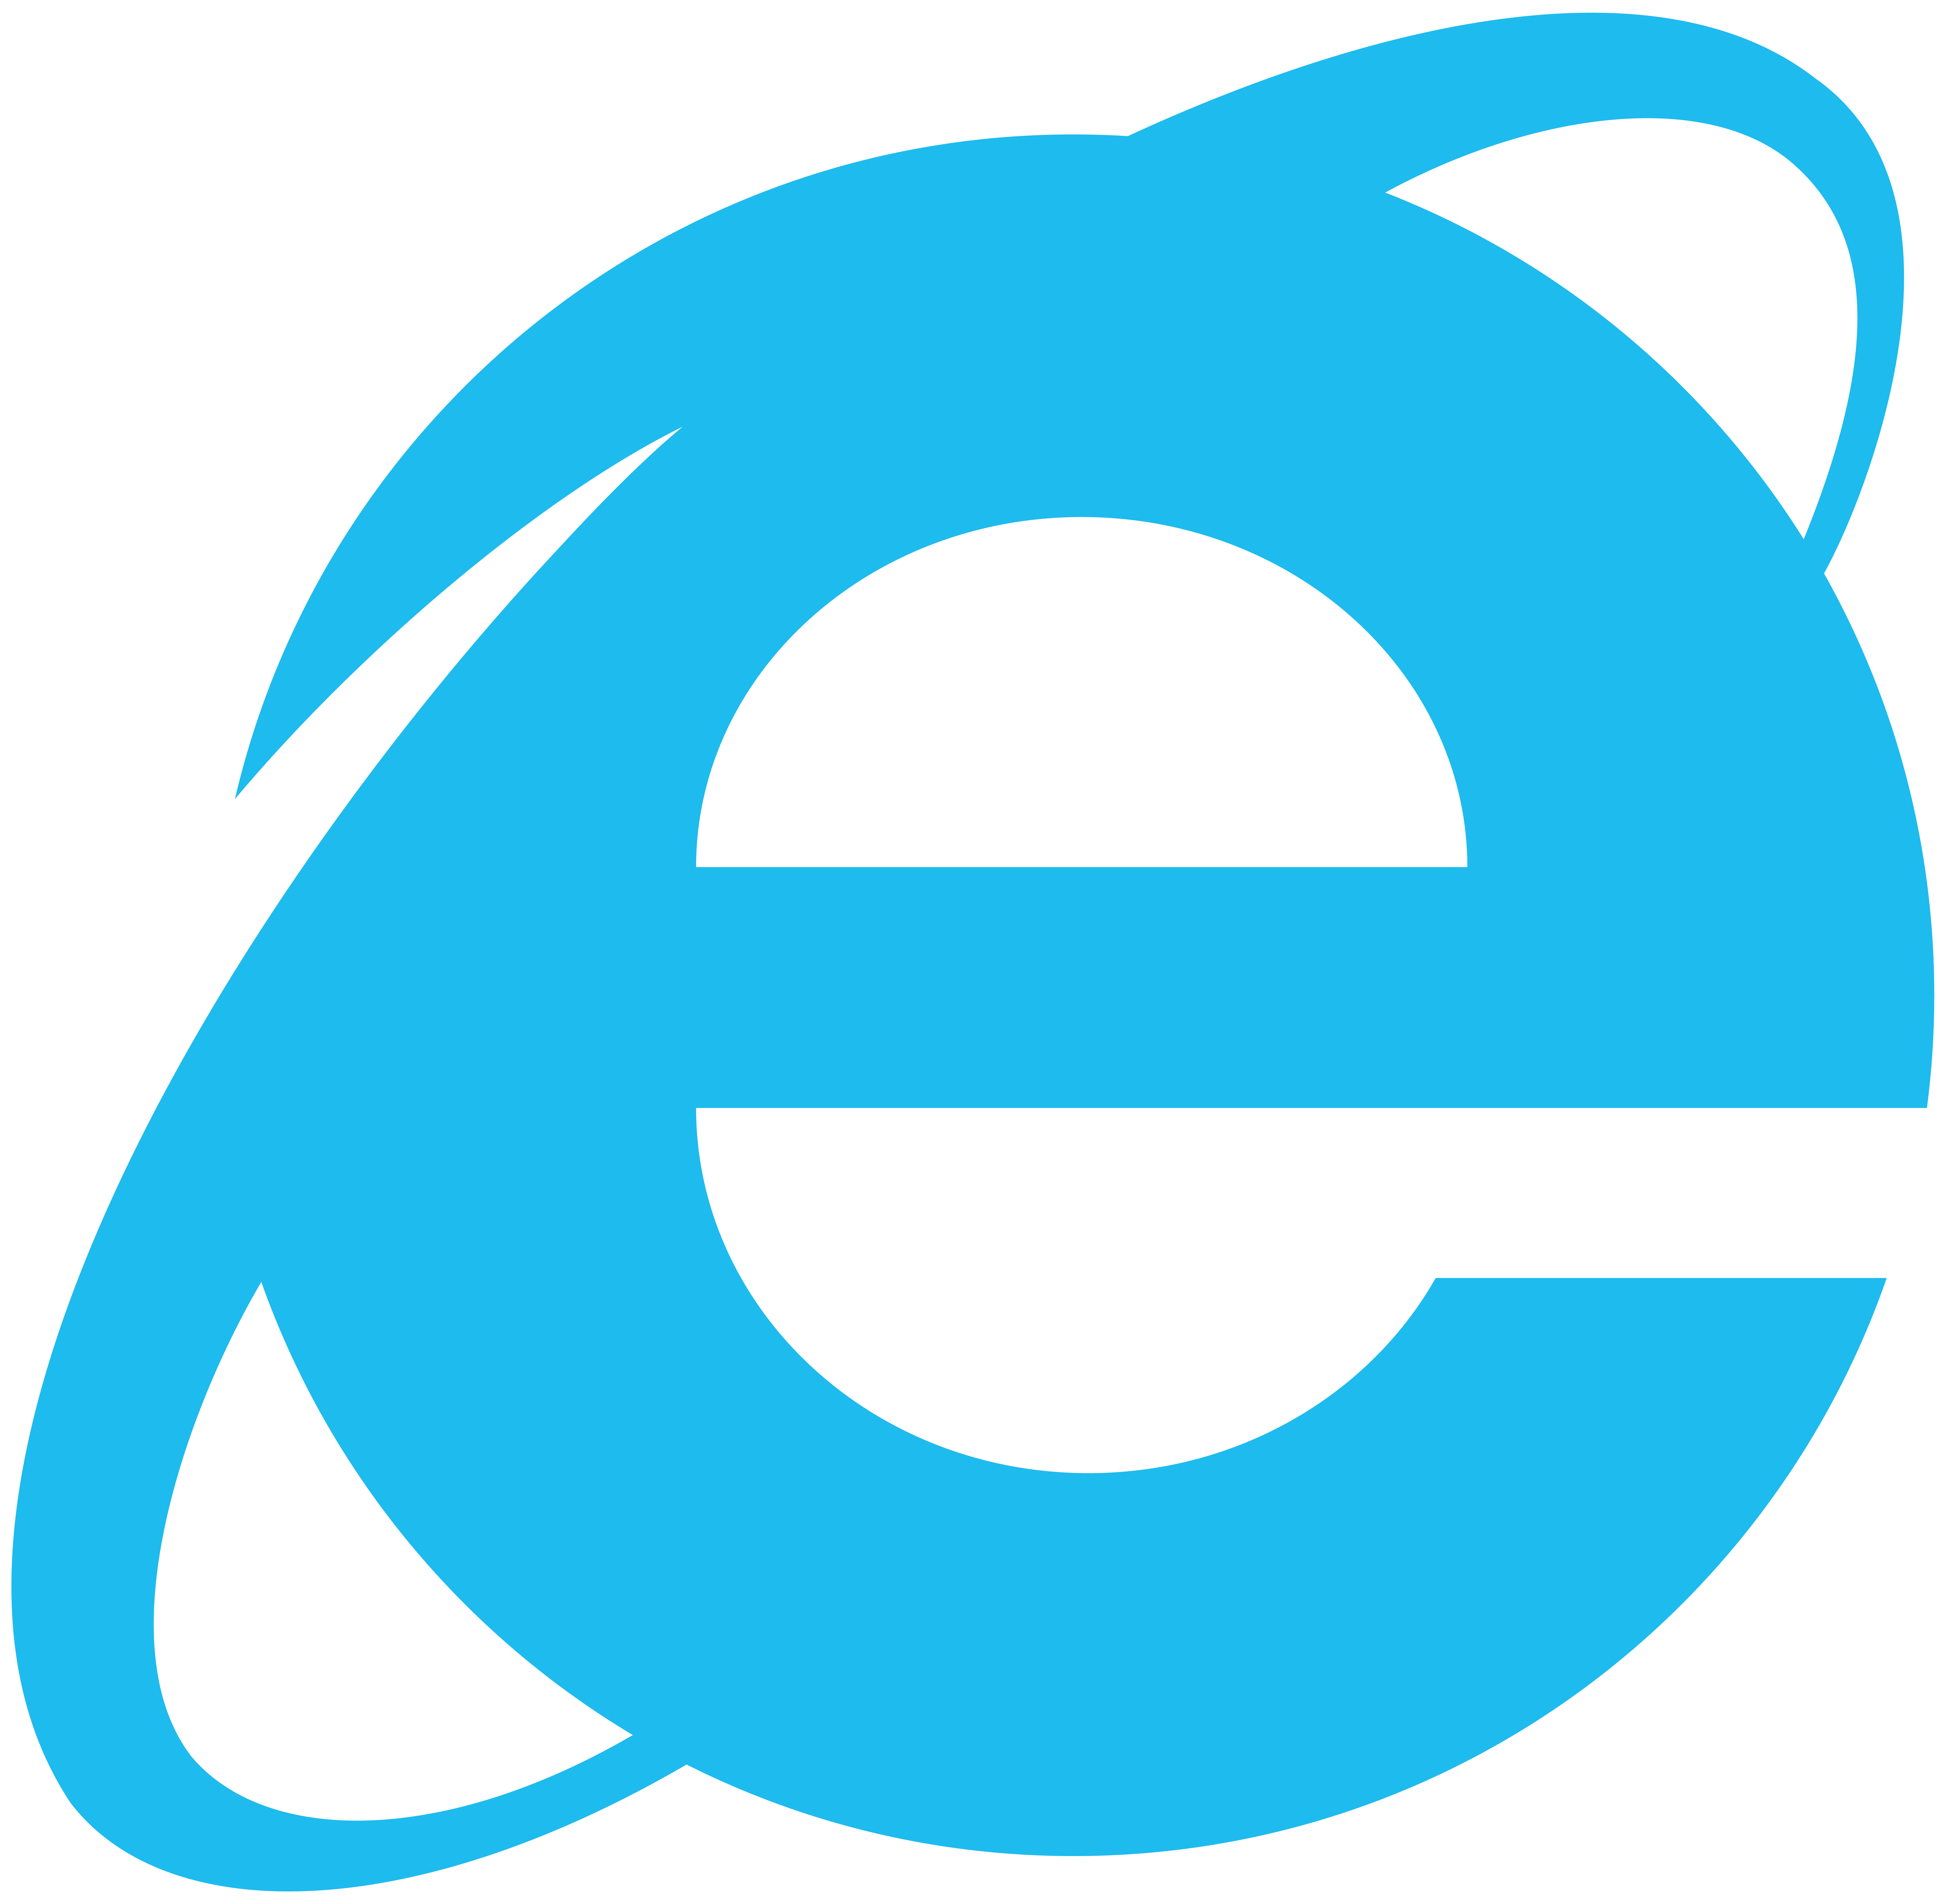 Internet Explorer Simplistic Logo  Vector by Luchocas on deviantARTInternet Explorer 10 Logo Png